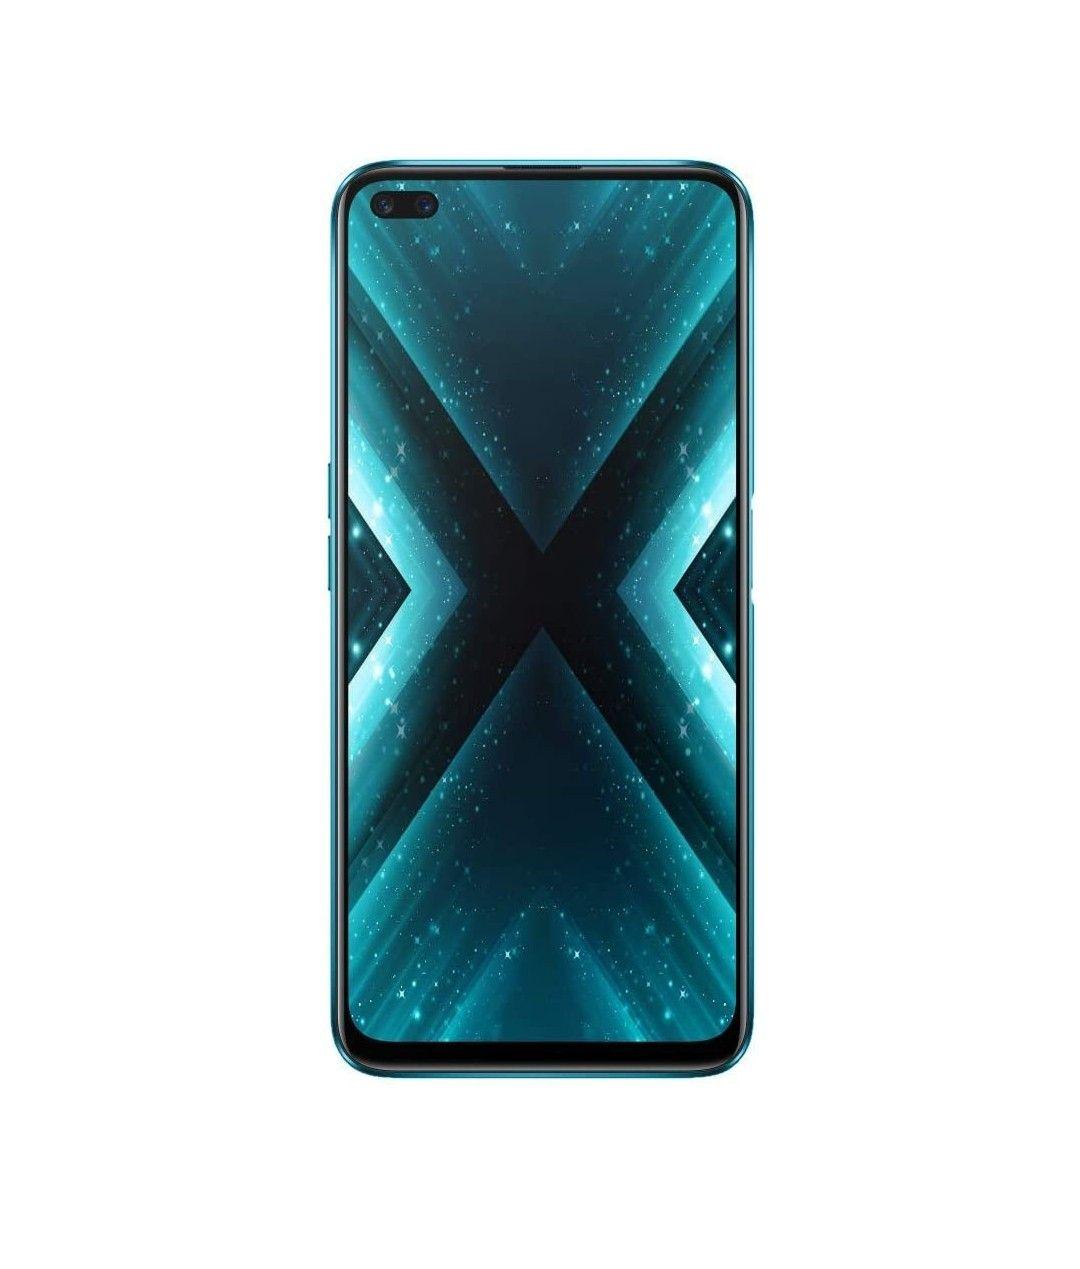 Realme x3 superzoom (12GB+256GB) glacier blue - £349.99 @ Amazon